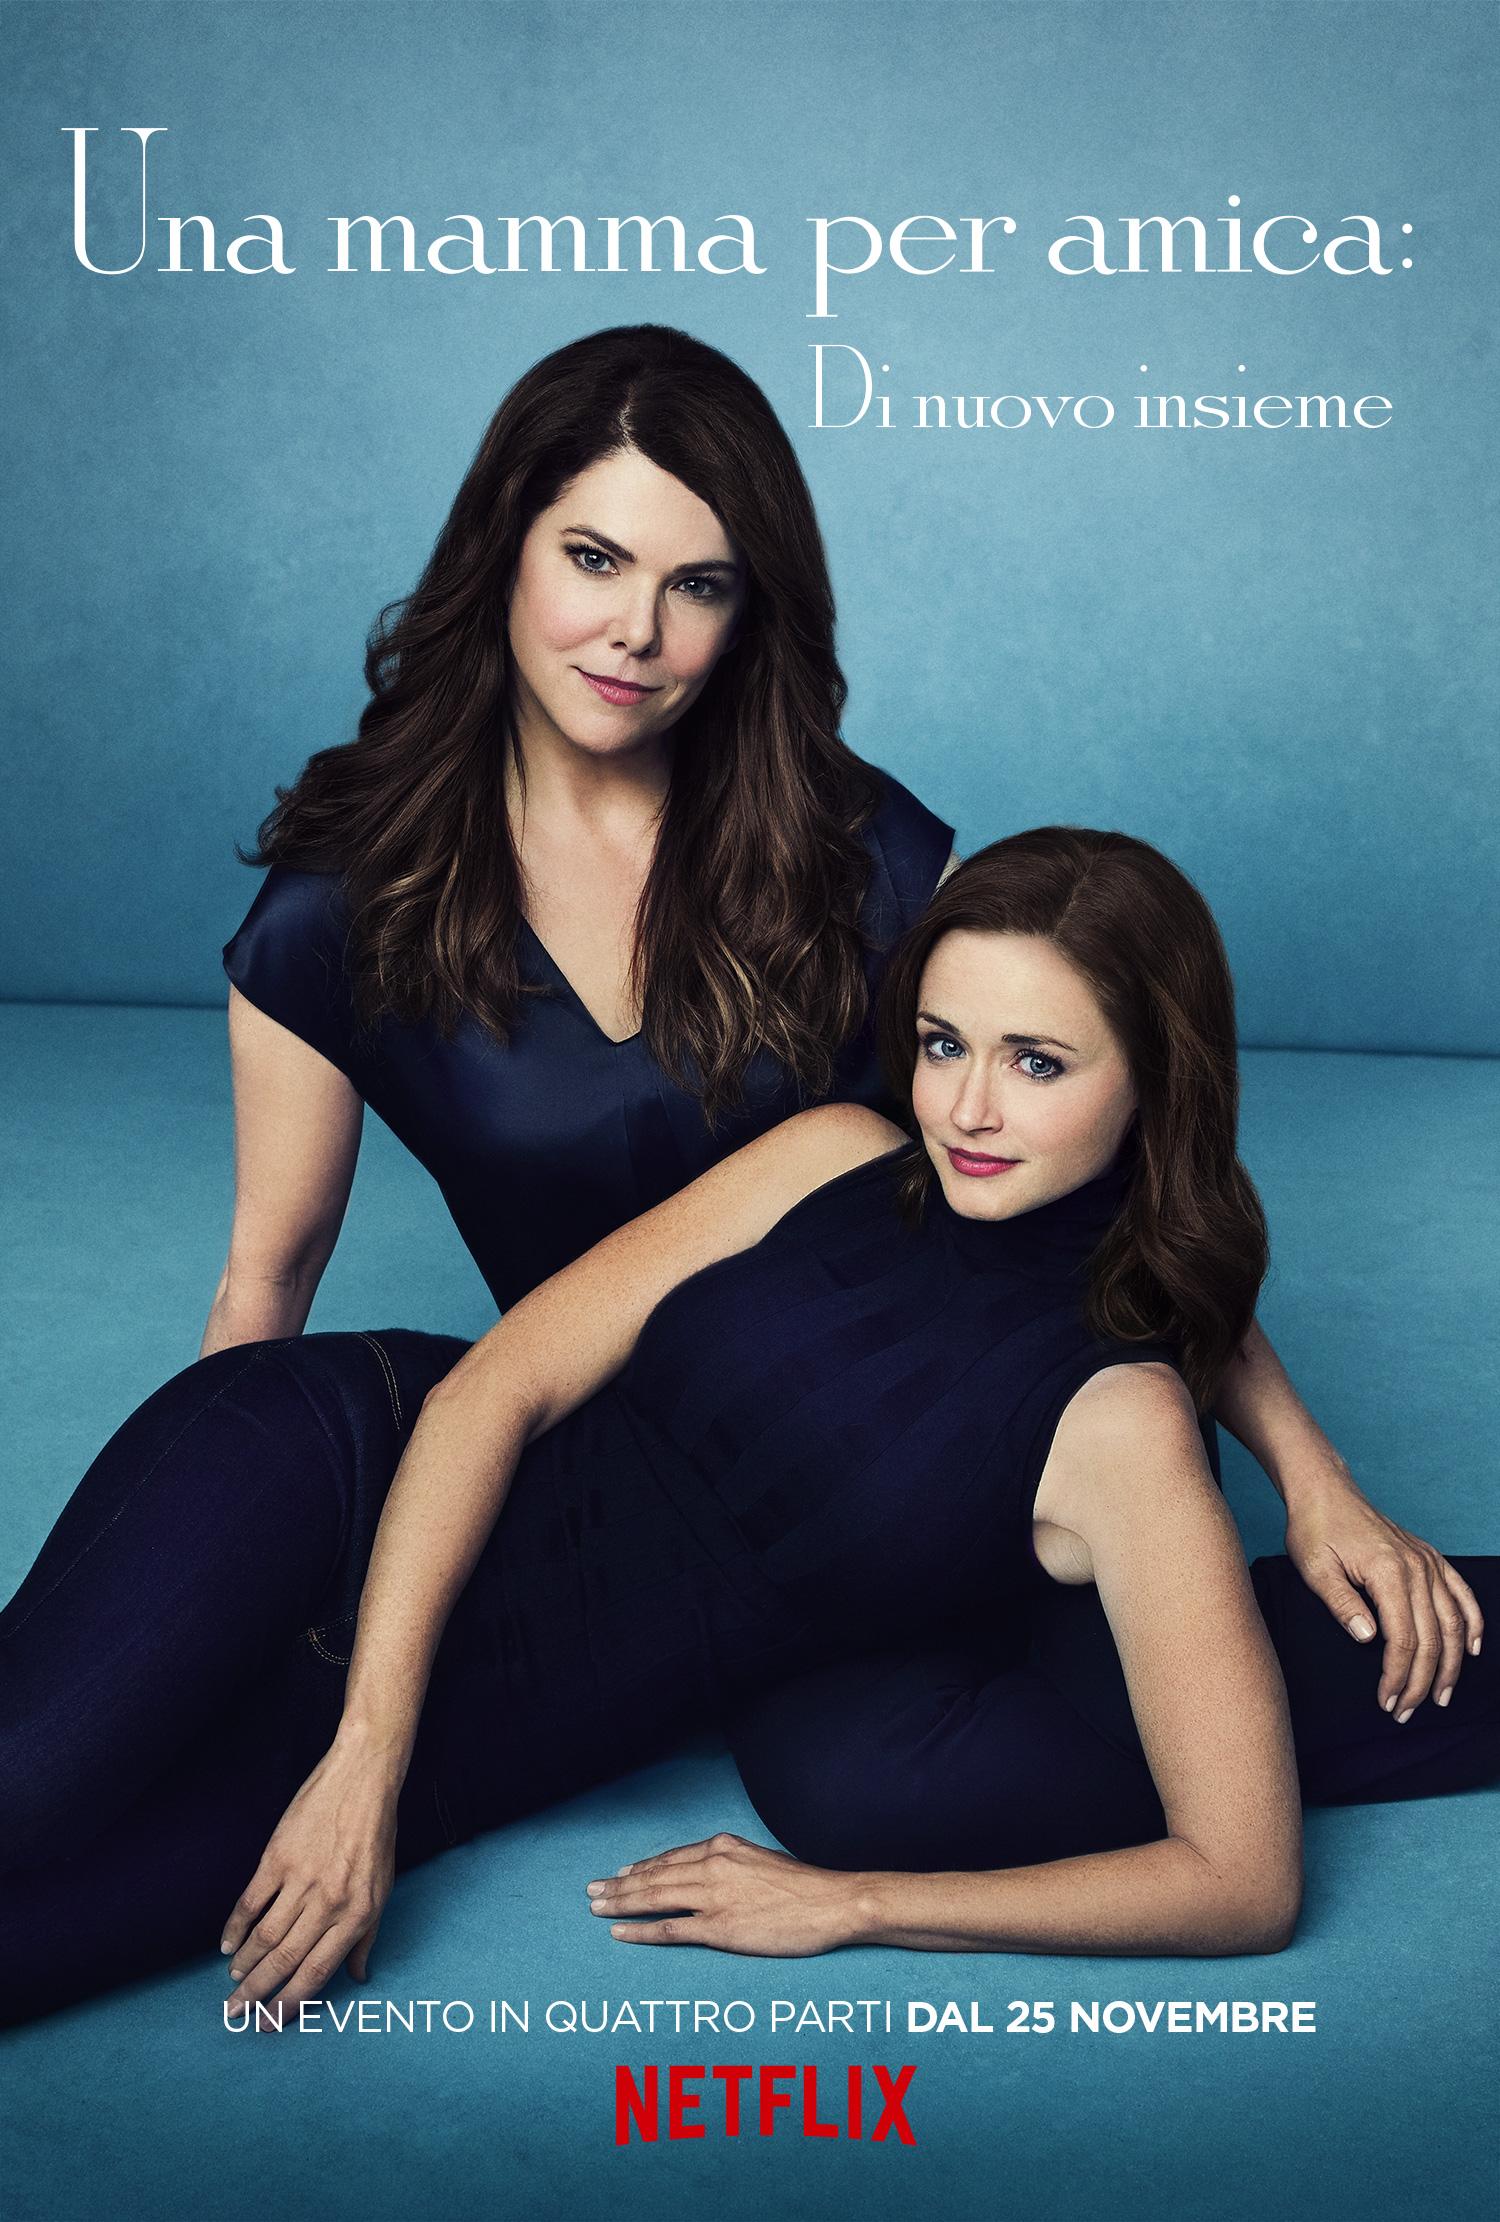 Una mamma per amica: di nuovo insieme - Alexis Bledel e Lauren Graham in un character poster